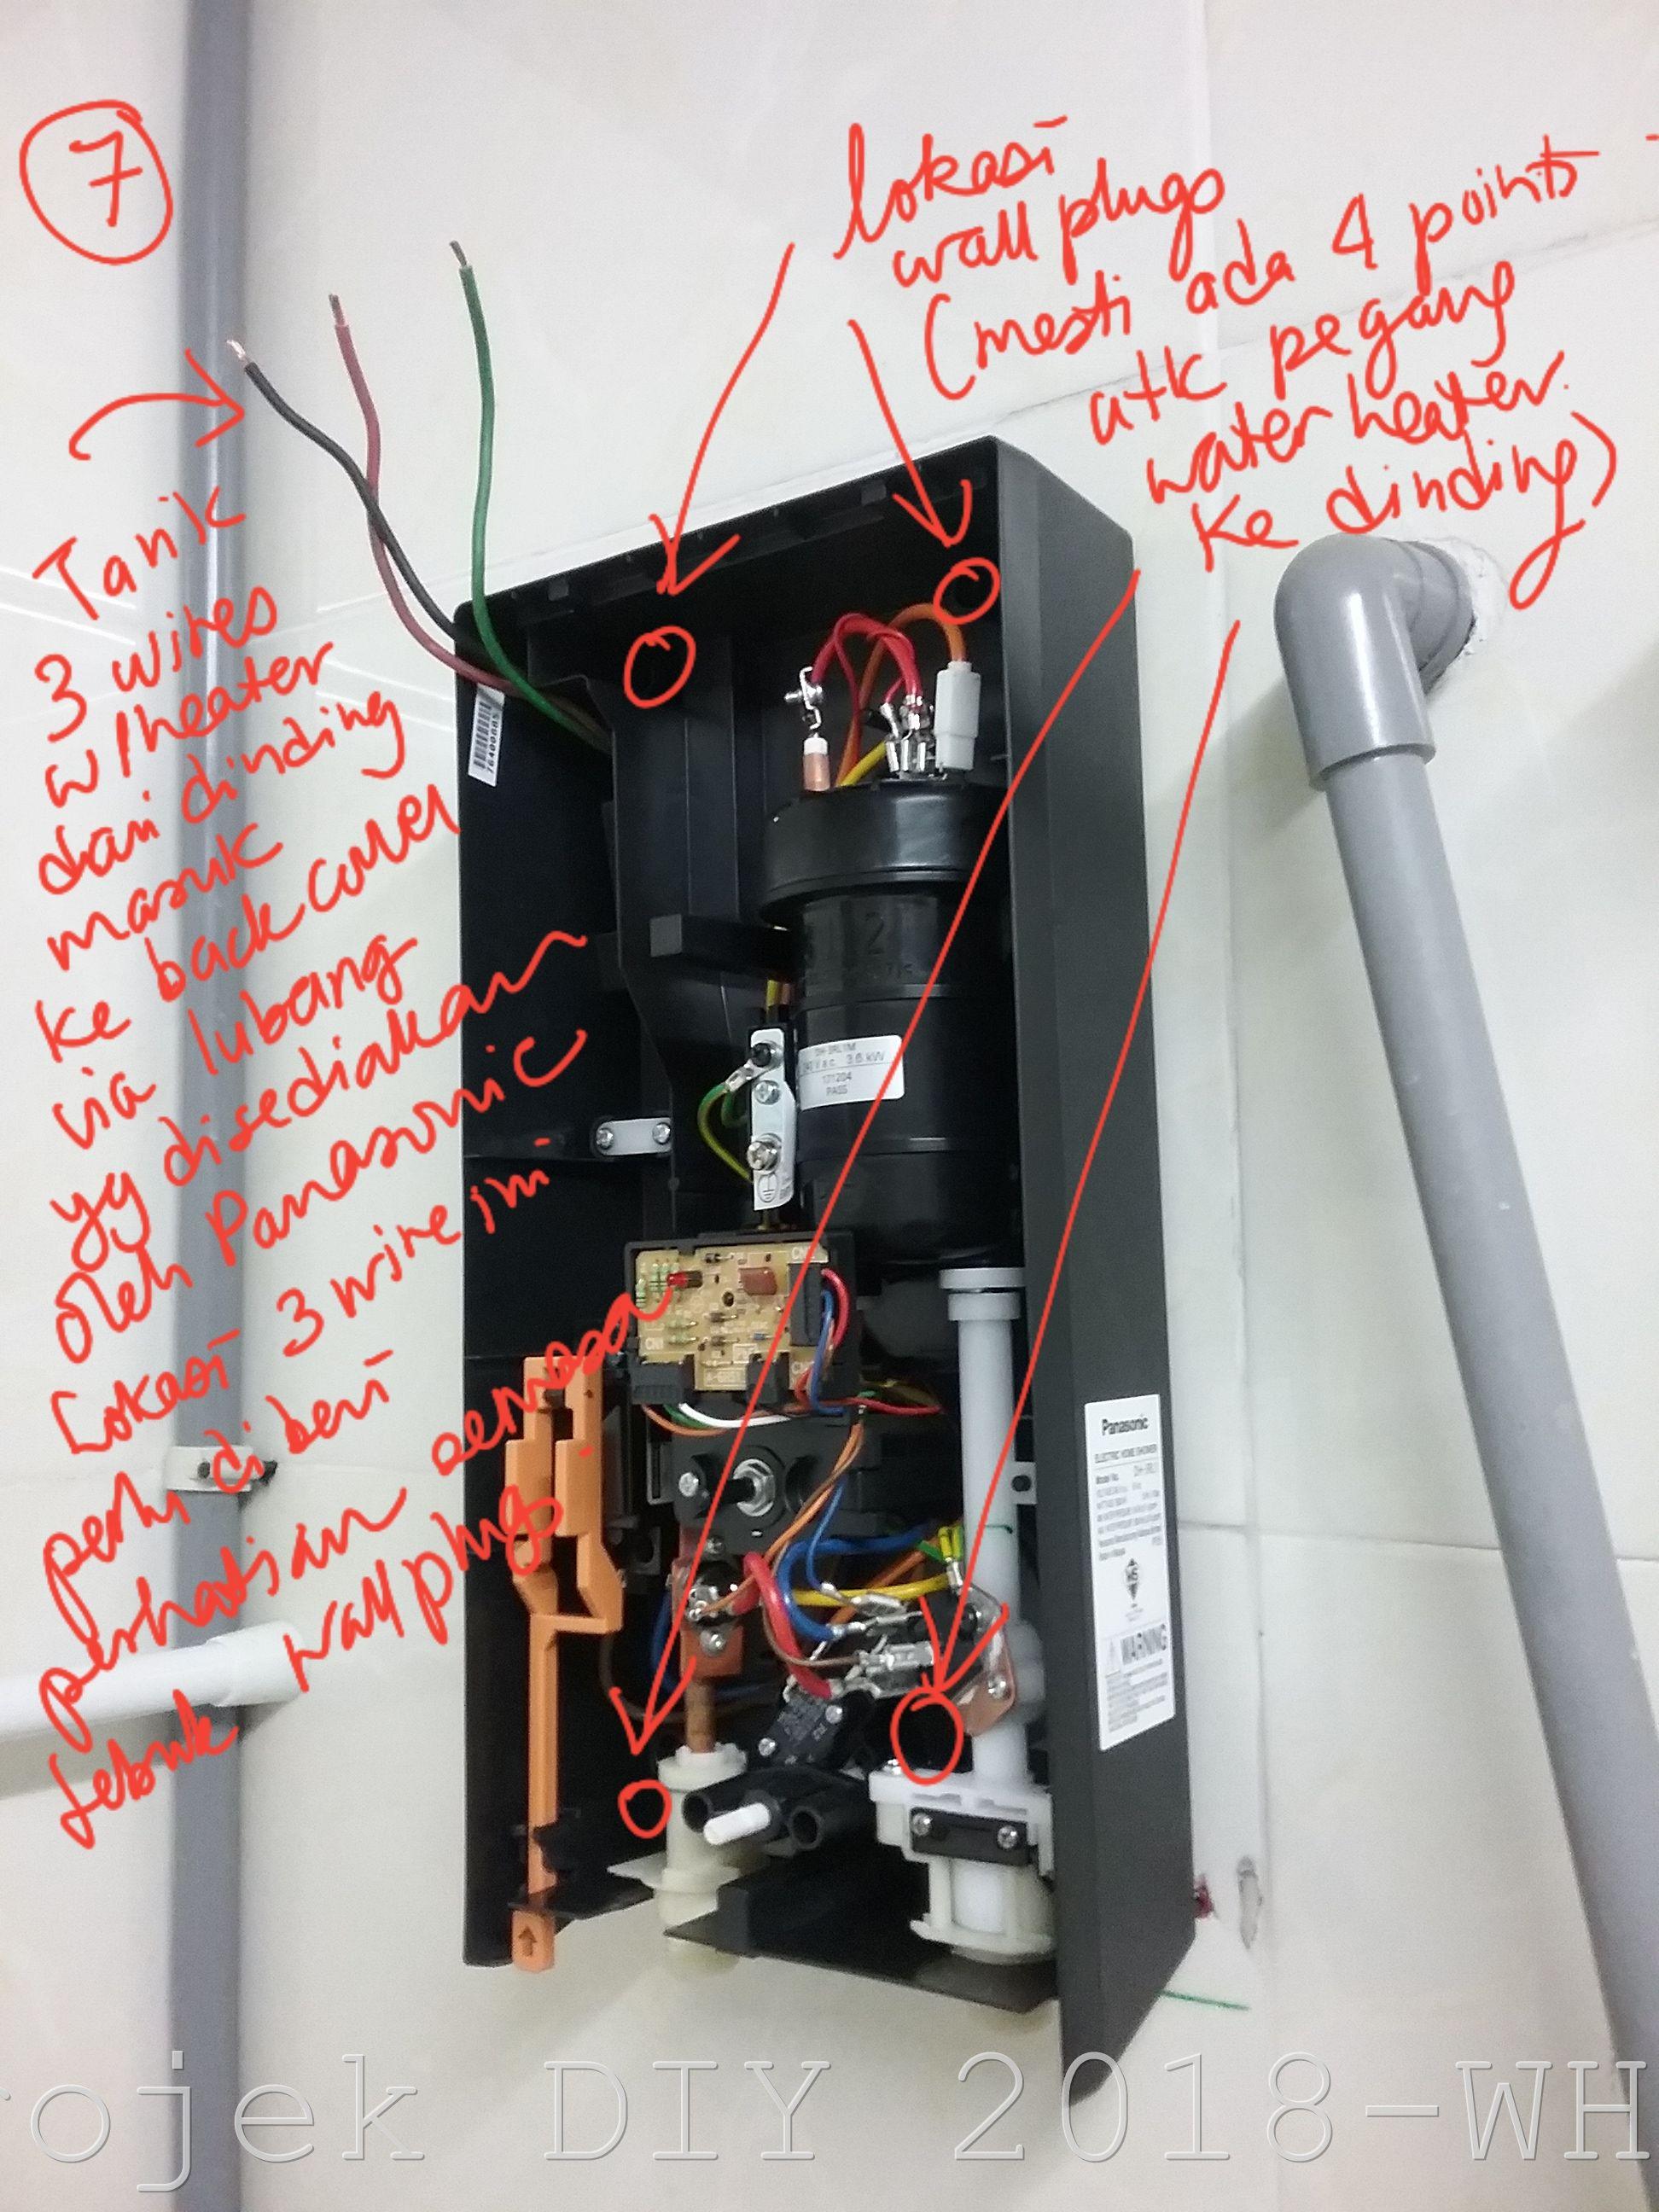 Sensational Cara Pasang Water Heater Sendiri Bumisepi Com Wiring Digital Resources Zidurslowmaporg